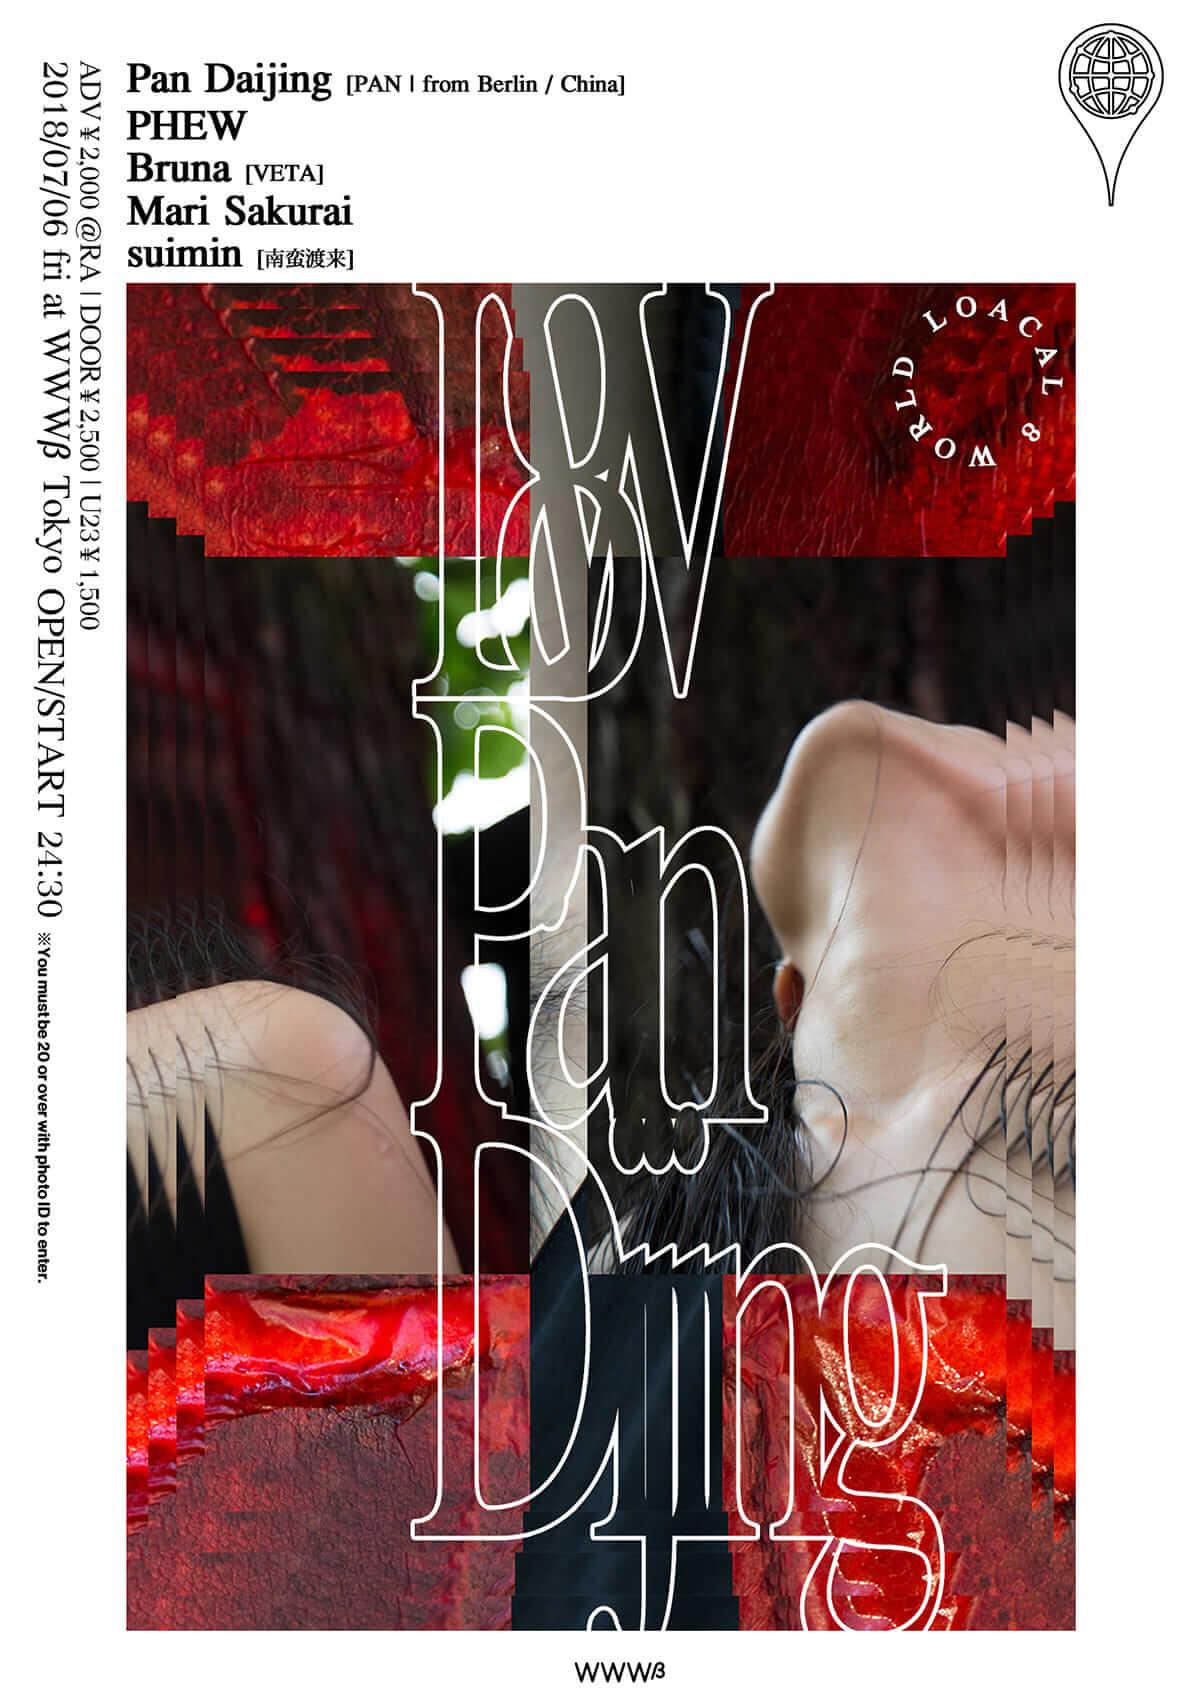 Pan Daijingの初来日公演が<local World>第8弾で実現|PHEWやBruna(VETA)、Mari Sakurai、suimin(南蛮渡来)ら出演 music180706_localworld_pan_daijing_6-1200x1703